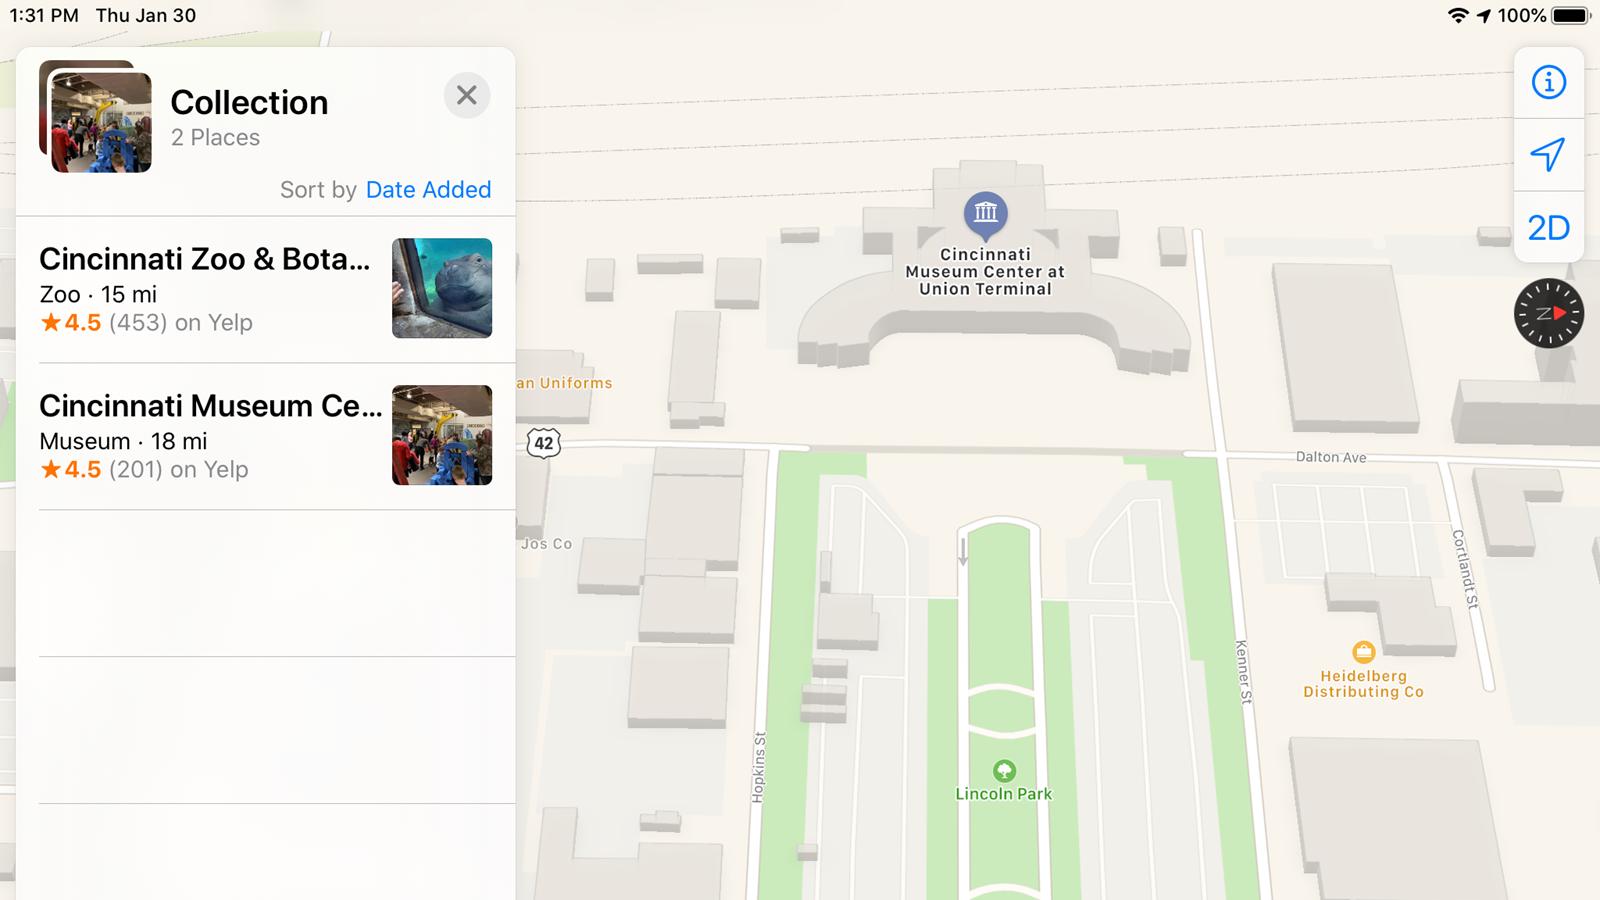 An Apple Maps view of the Cincinnati Museum Center